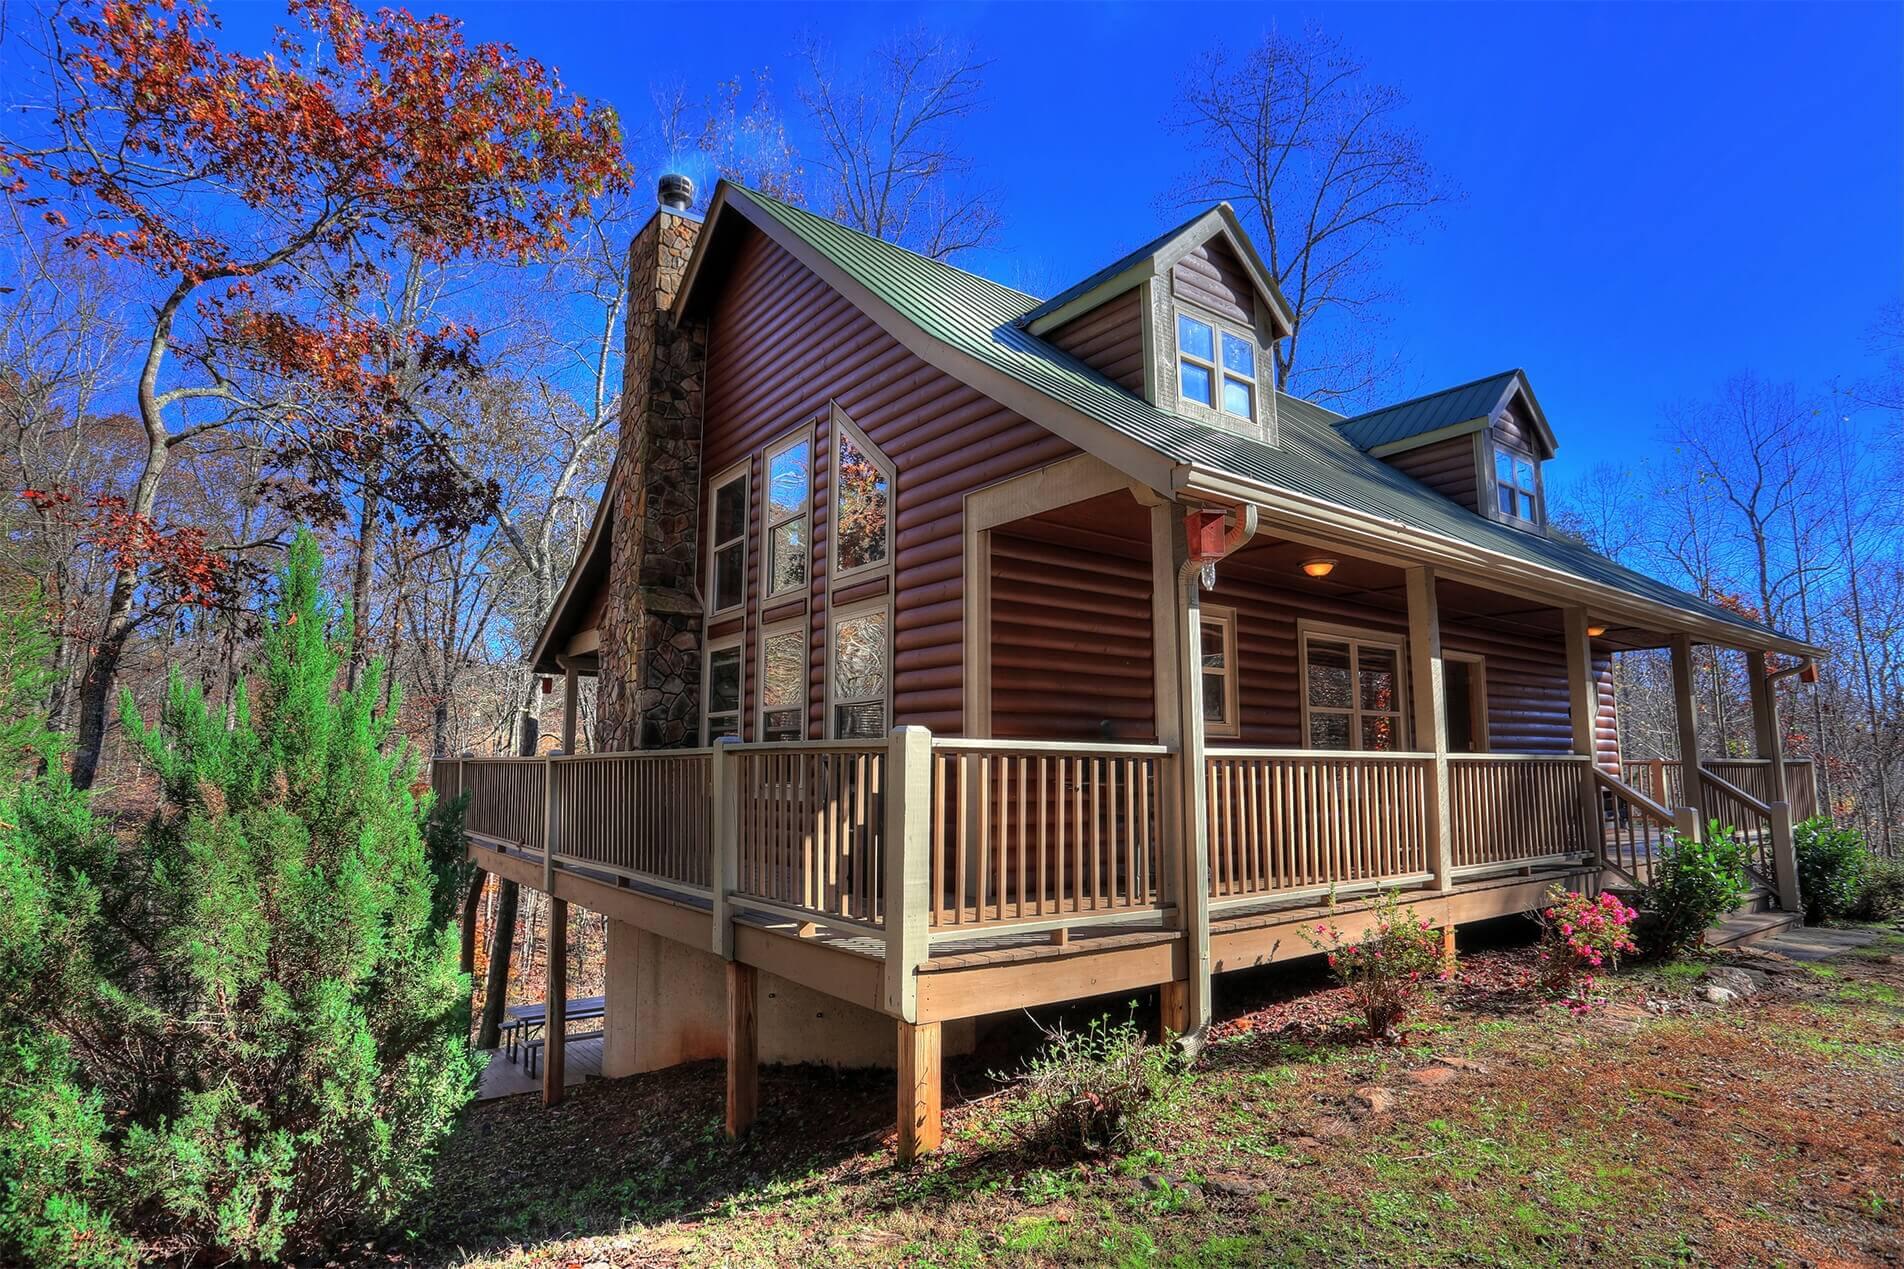 Holiday-Cedar-Creek-Cabin-Rentals-Helen-Georgia-top-banner-tiny